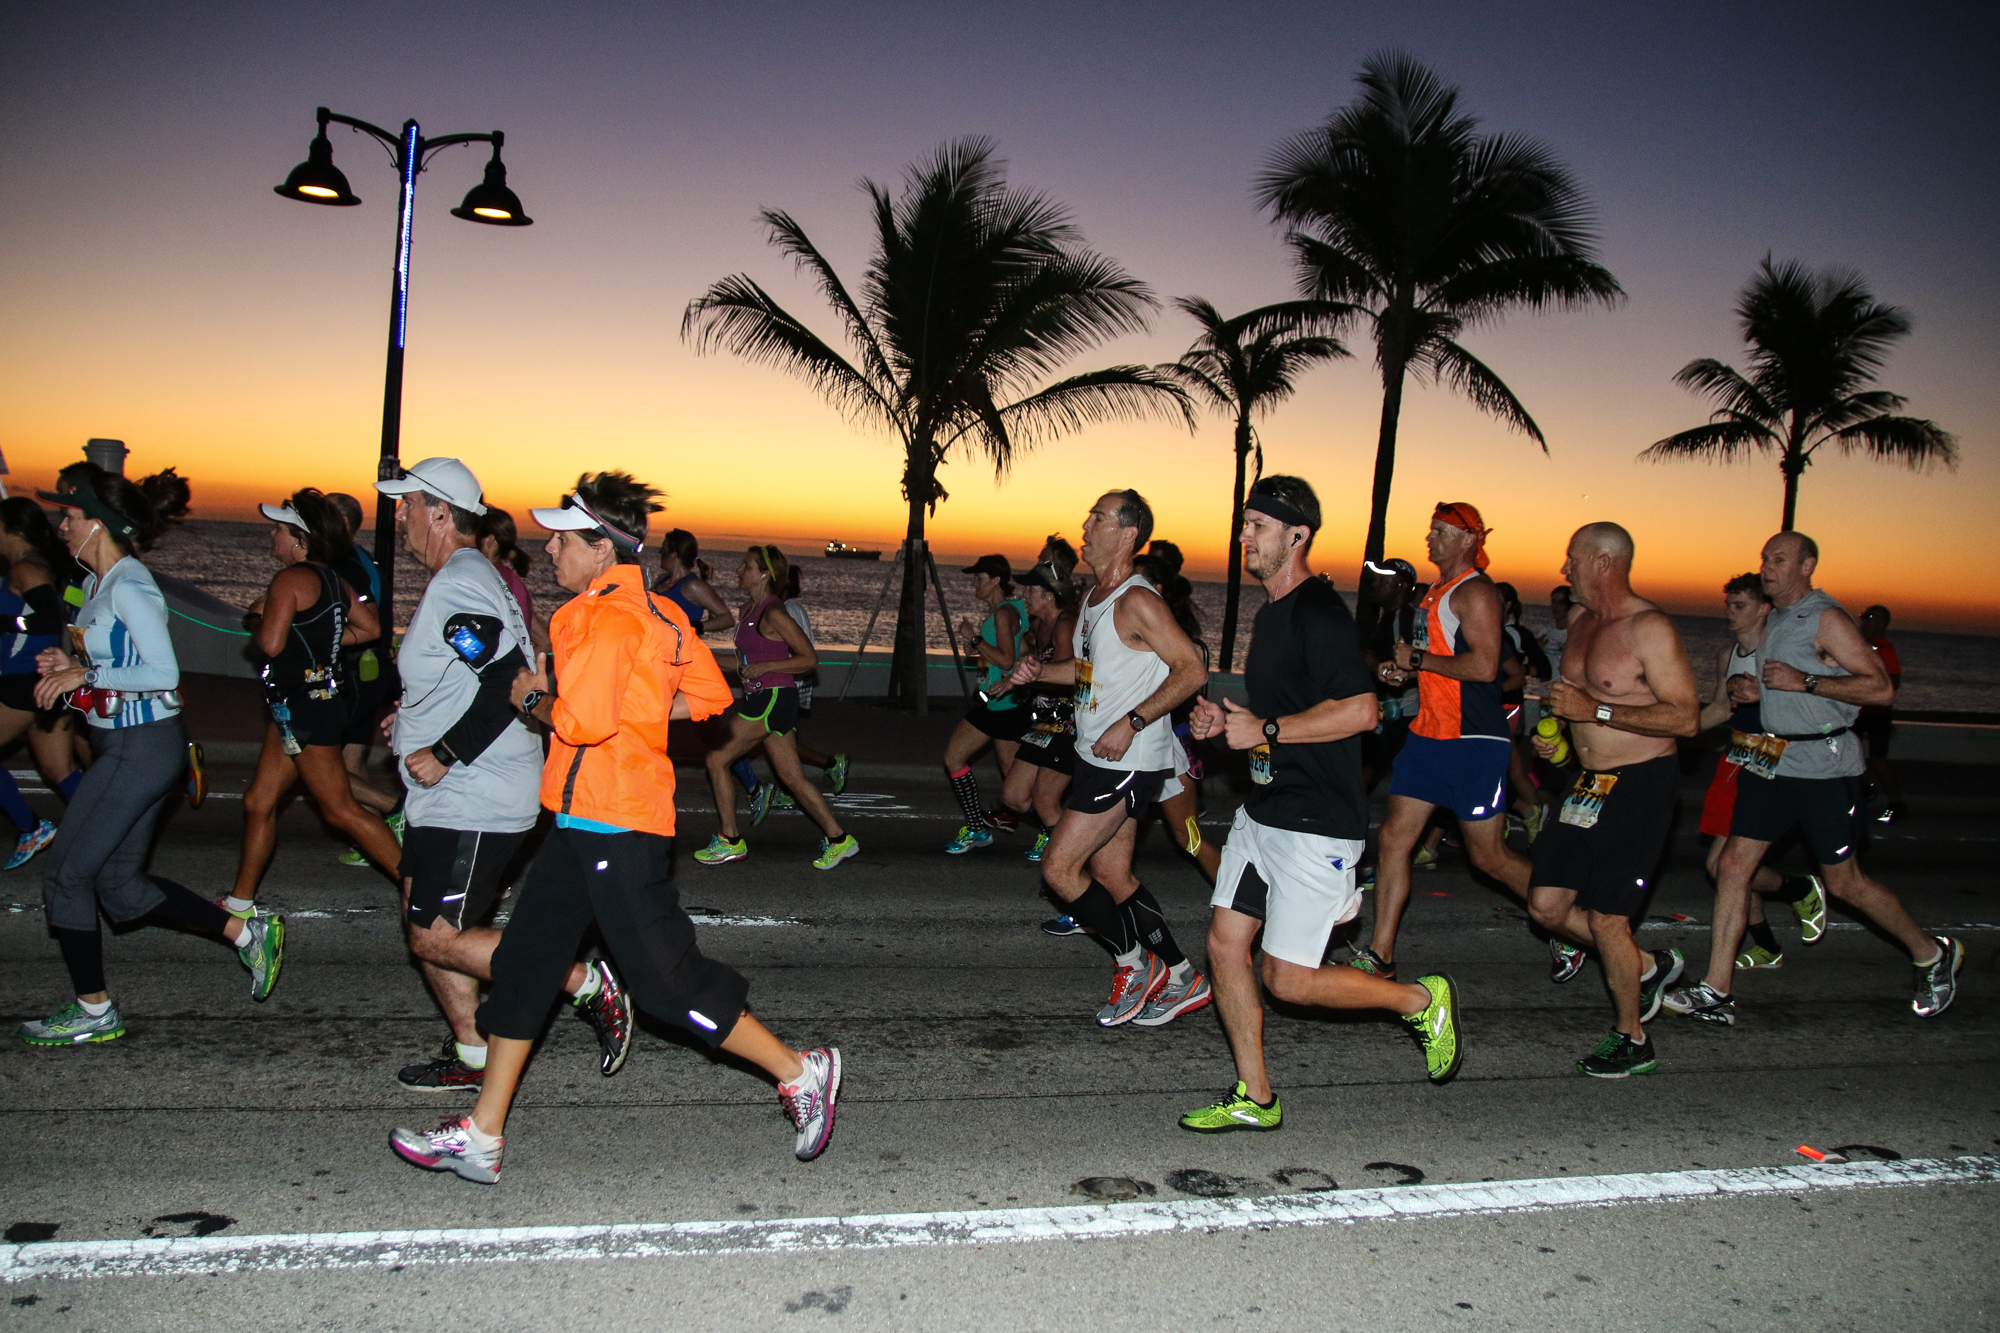 2018 3rd Annual Naked Feet Barefoot 5K Fort Lauderdale